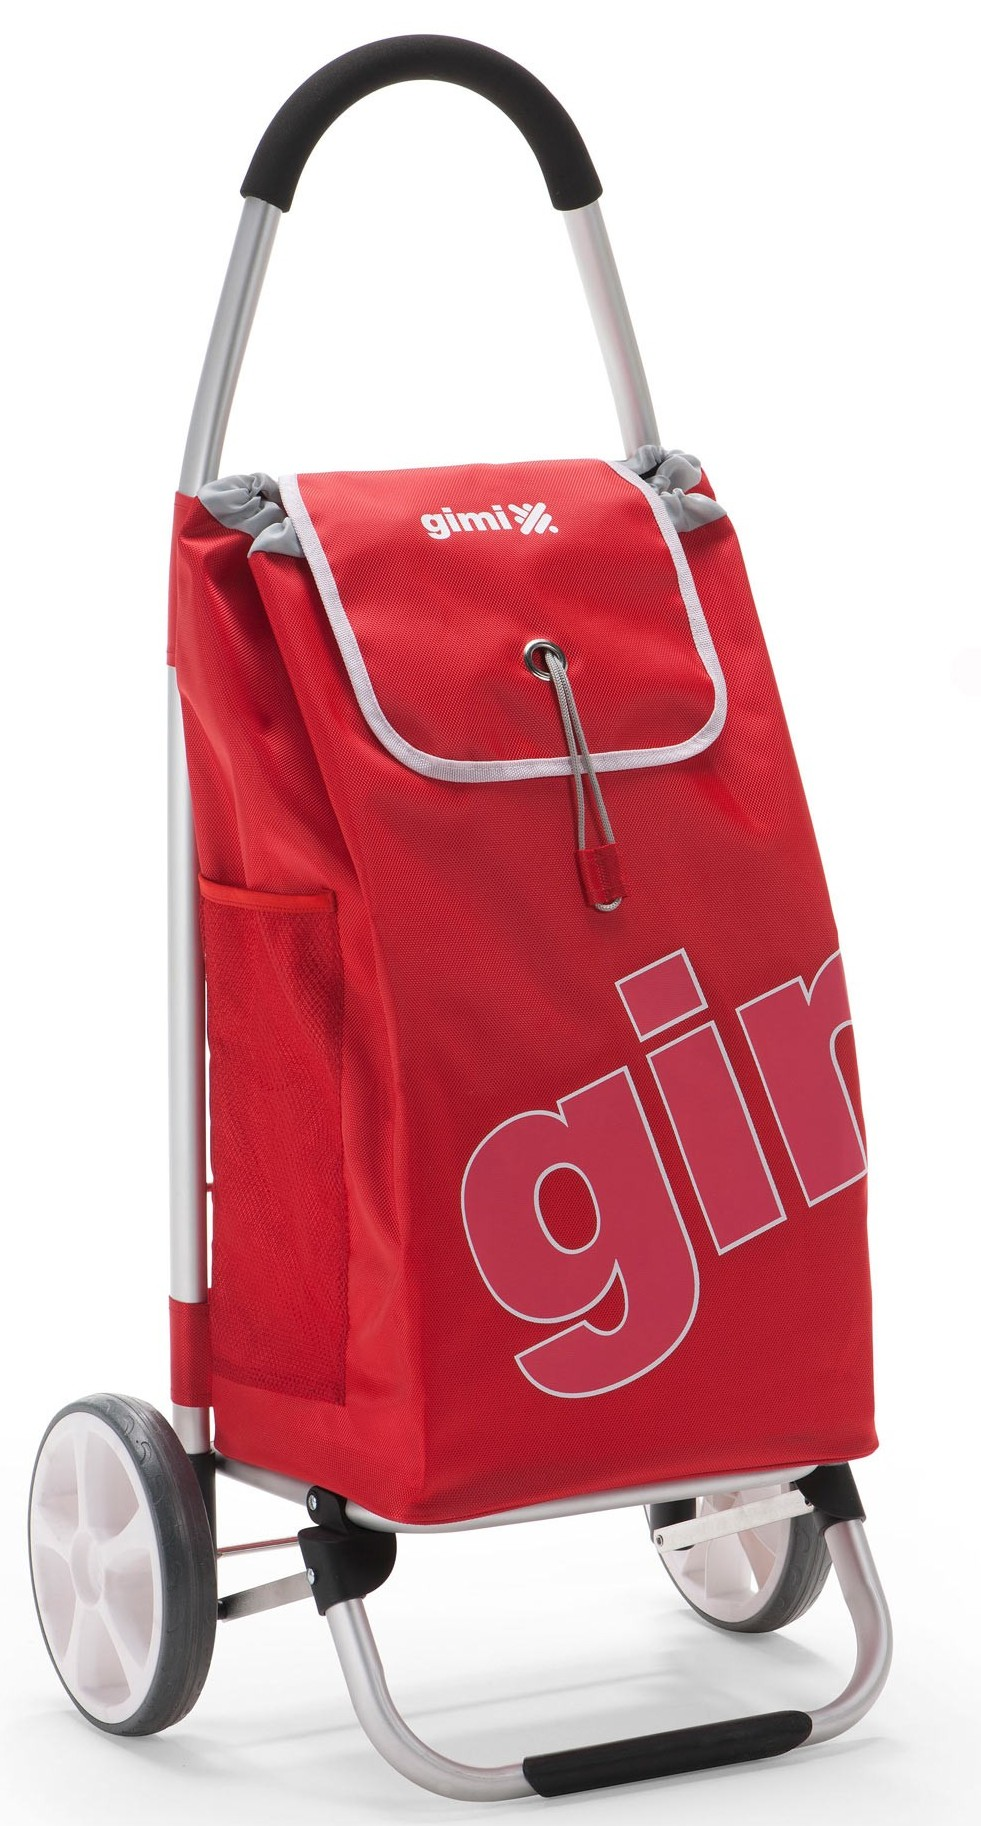 d1b817ed9844 Gimi Galaxy – купить сумку дорожную, сравнение цен интернет ...